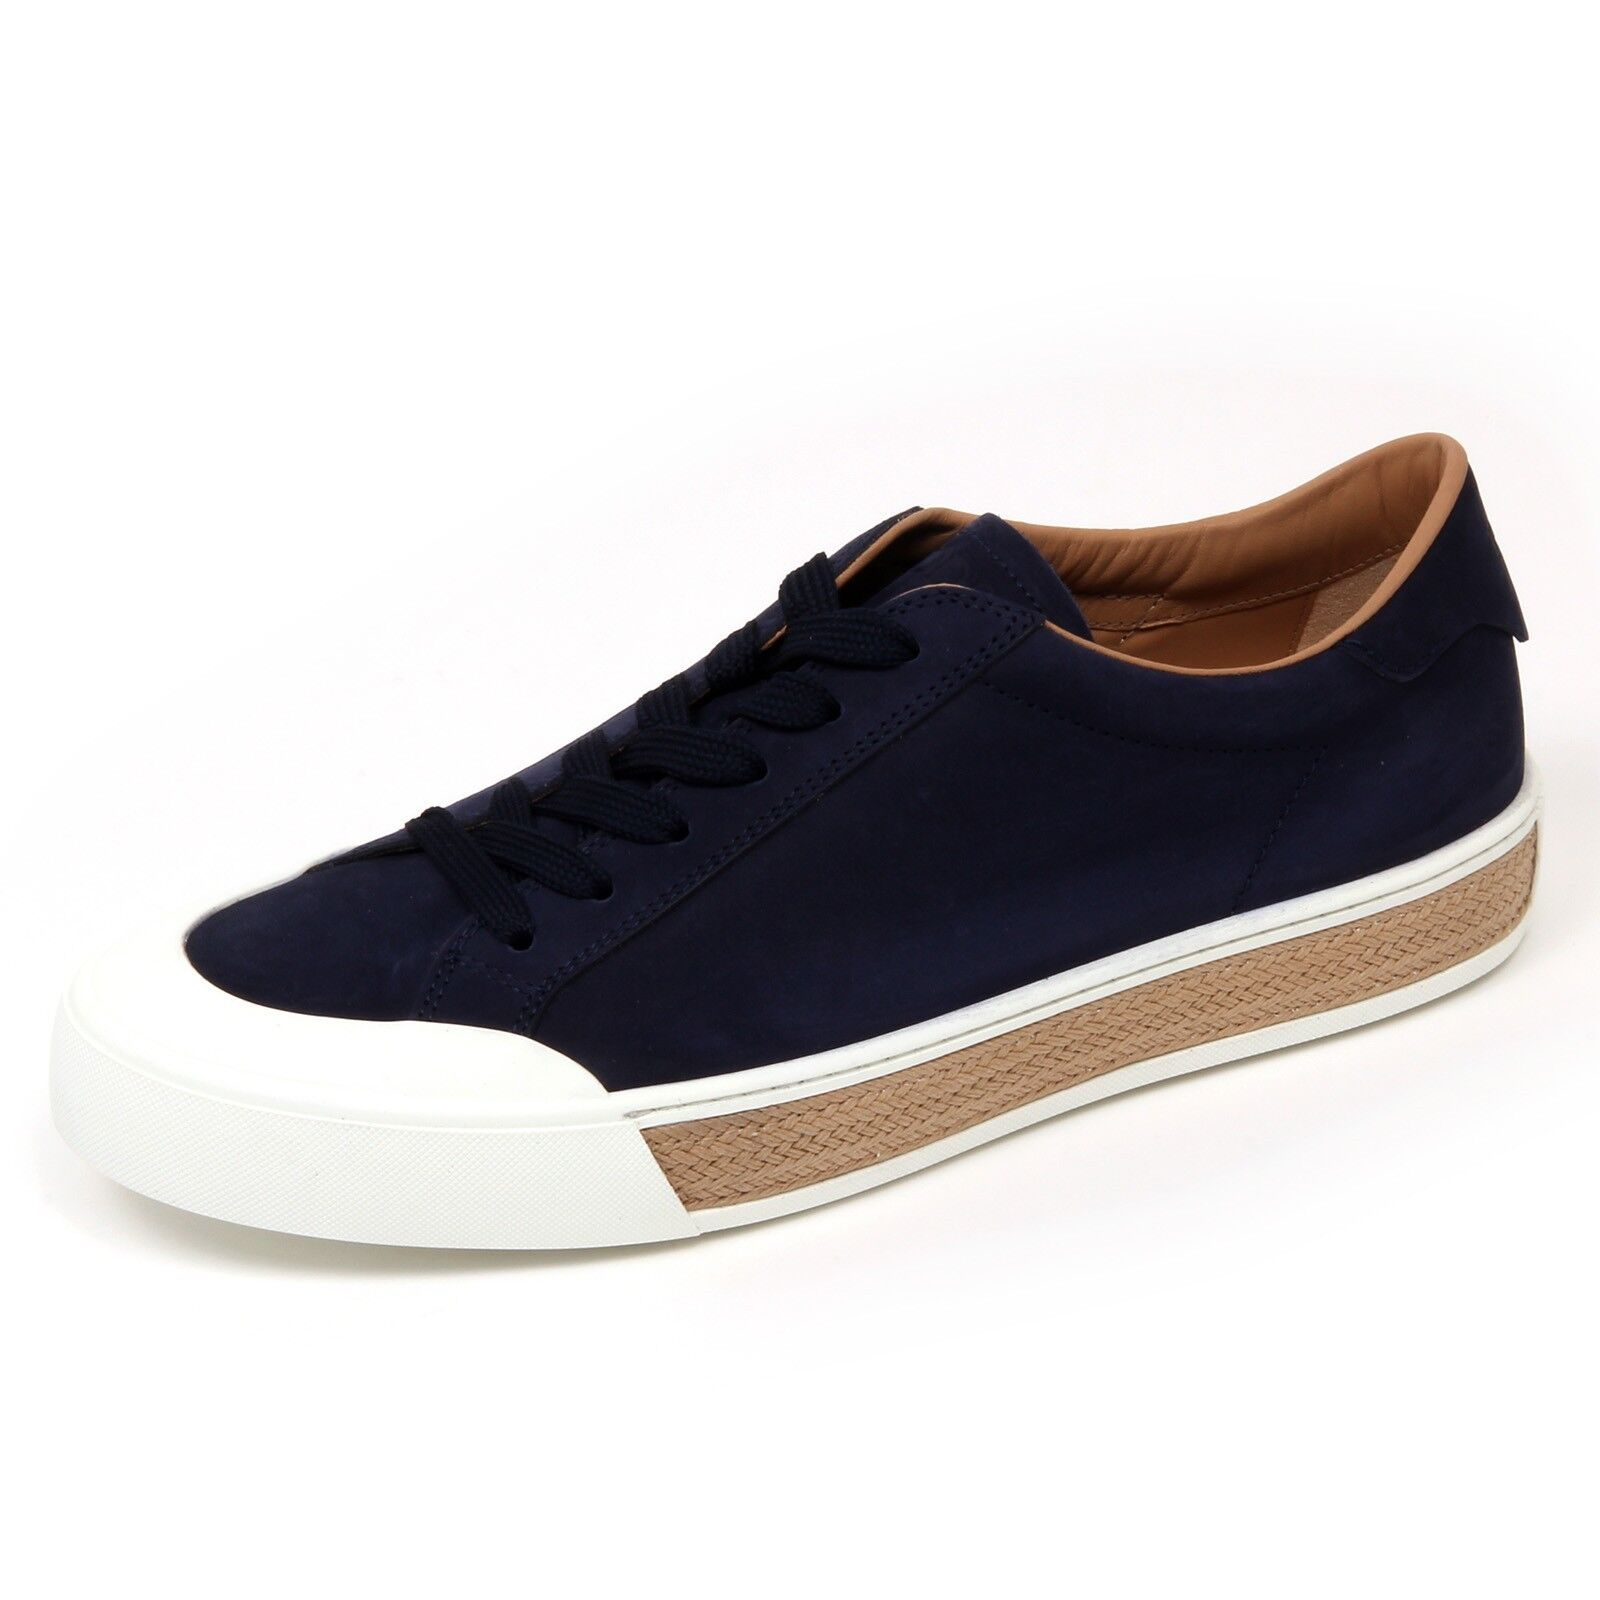 D0148 sneaker hombre Zapatos TOD'S CASSETTA GOMMA zapato blu scuro Zapatos hombre  Hombre 80fbb8